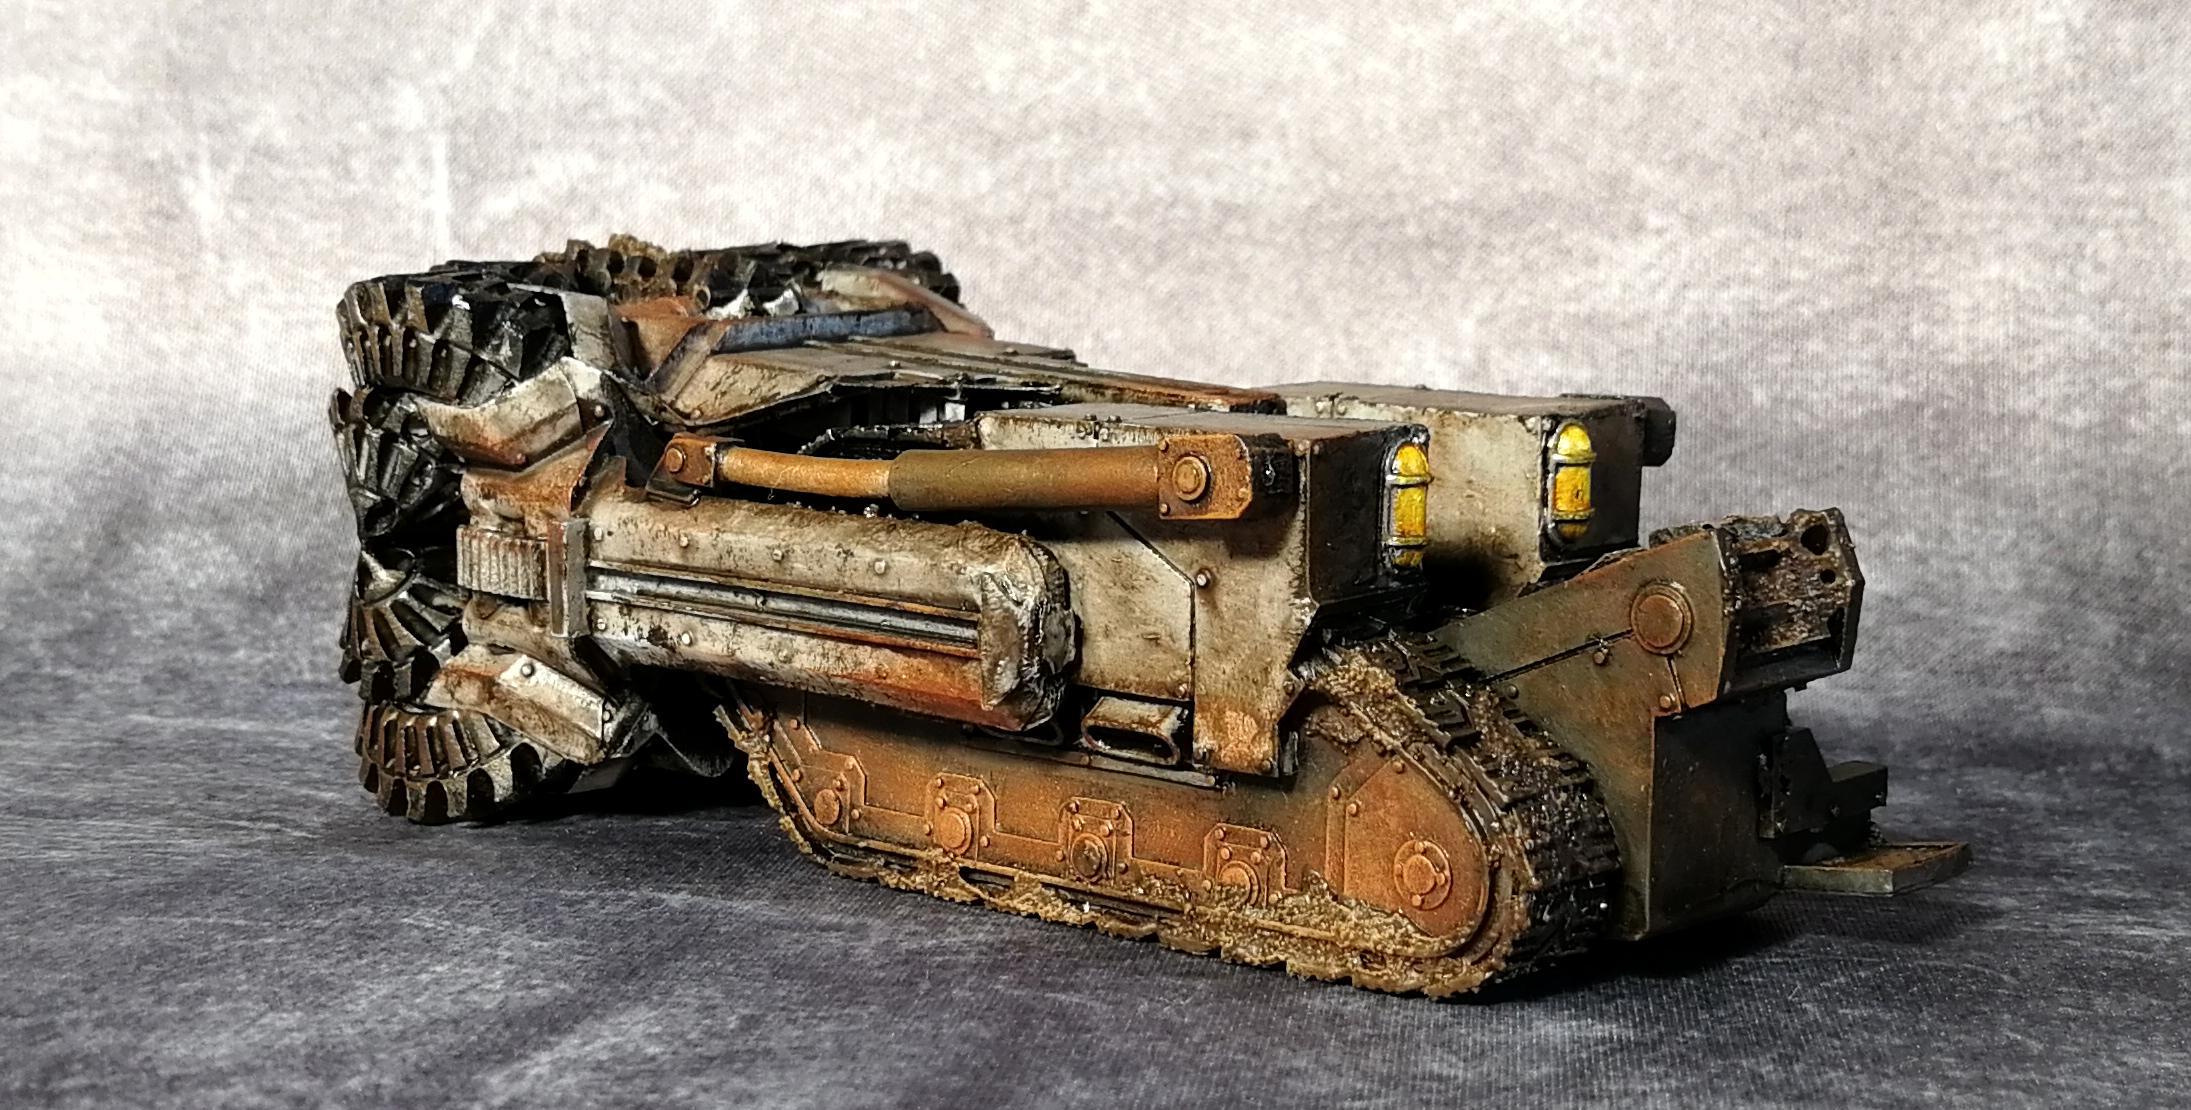 Death Korps of Krieg, Hades Breaching Drill, Rust, Warhammer 40,000, Weathered